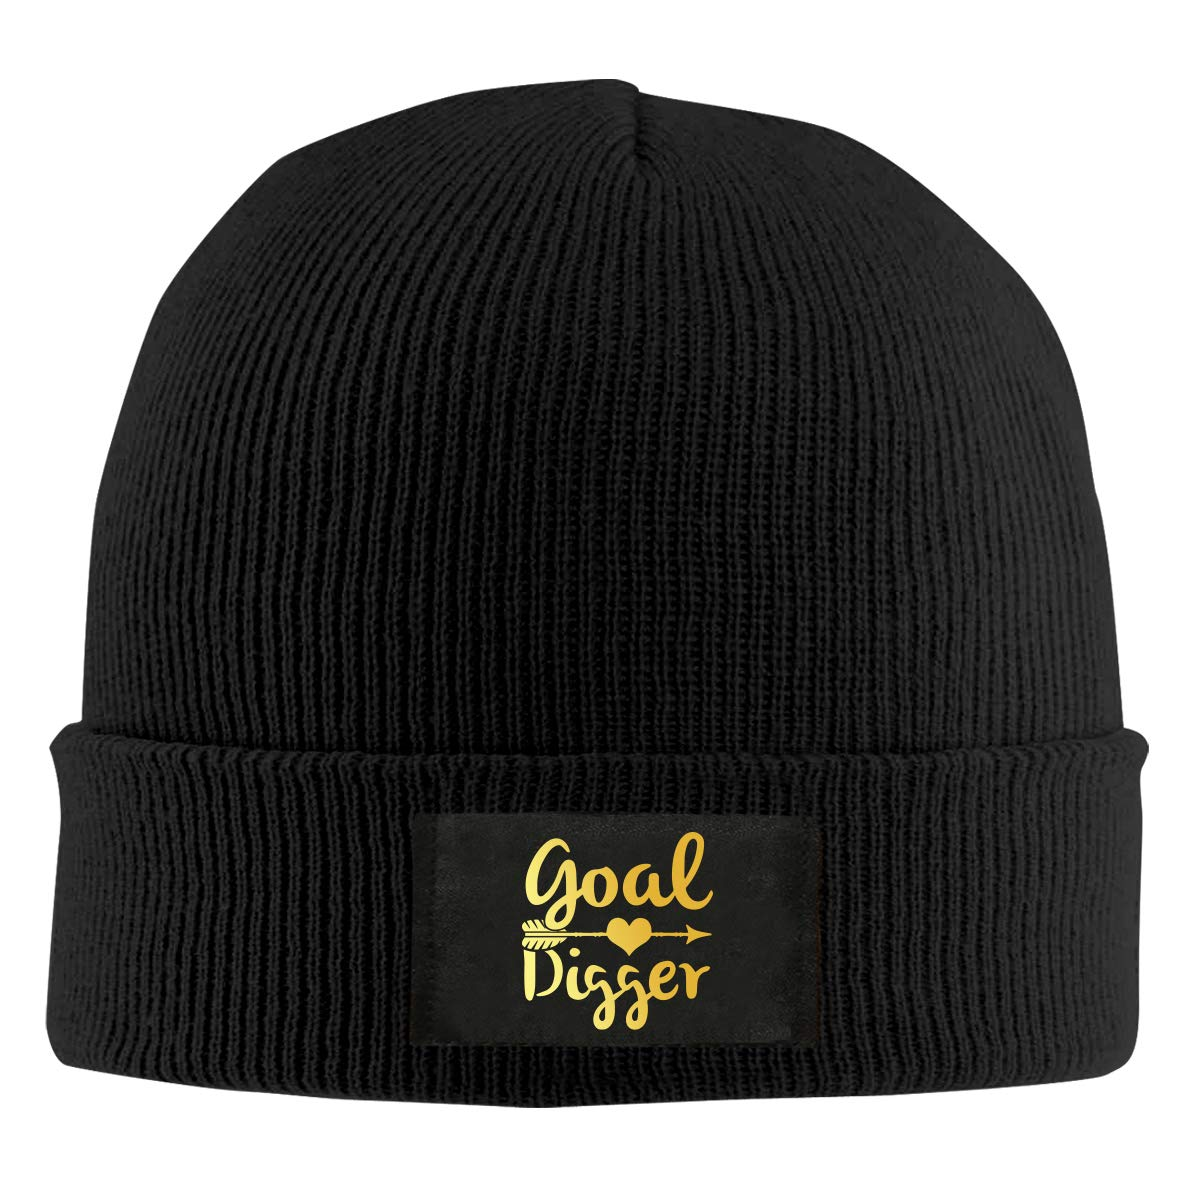 Goal Digger Women and Men Knitted Hat Winter Warm Skull Cap